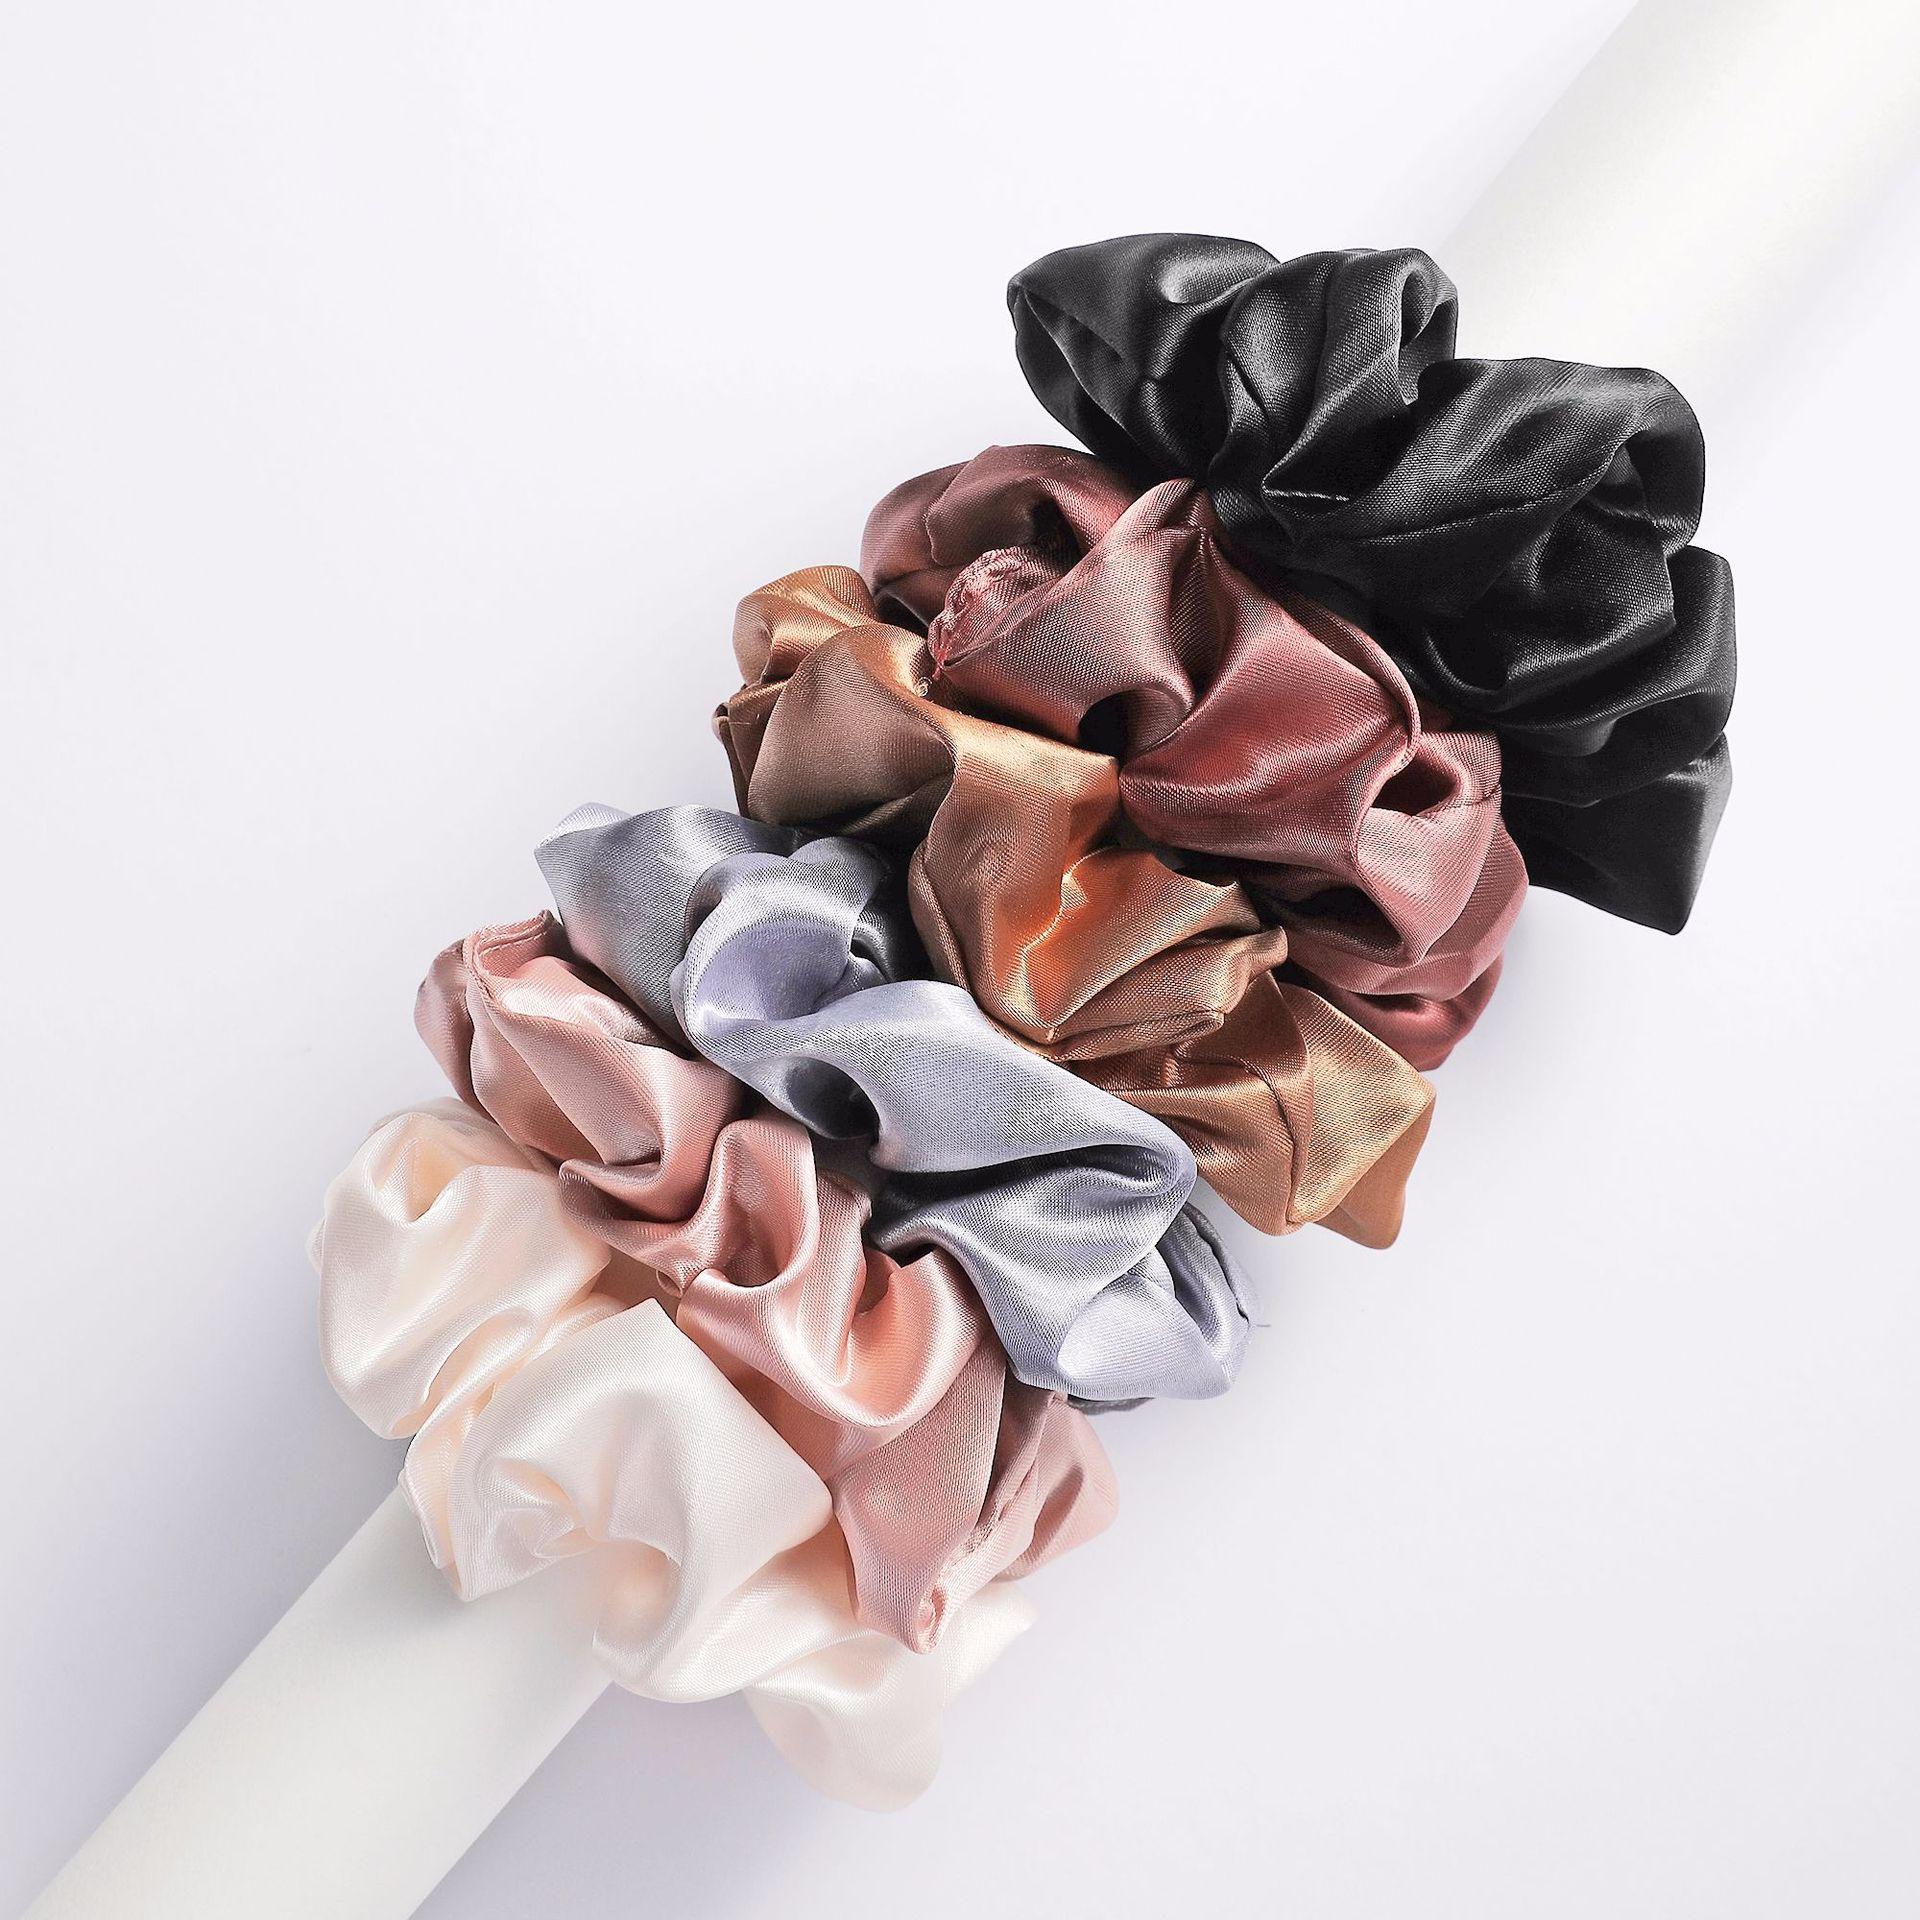 6pcs/lot Fashion Women Girls Silky Satin Hair Scrunchies Solid Stretch Elastic Hair Tie Simple Elegant Rubber Band Ponytail Tie